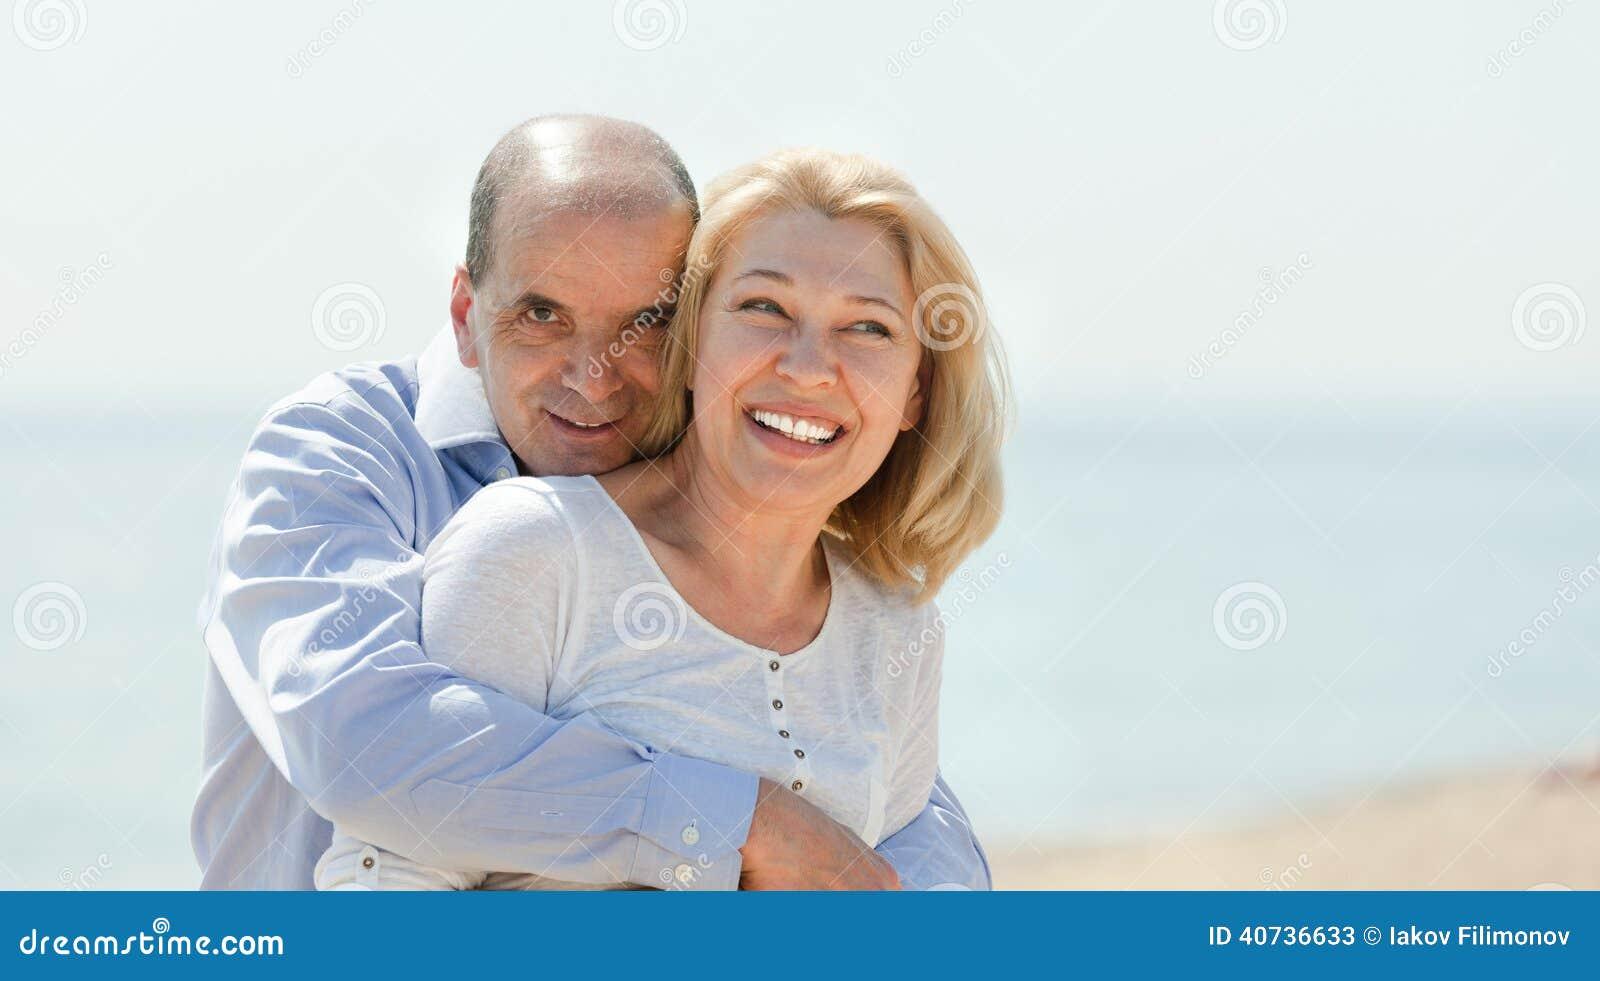 Elderly couple walking on the beach in summer